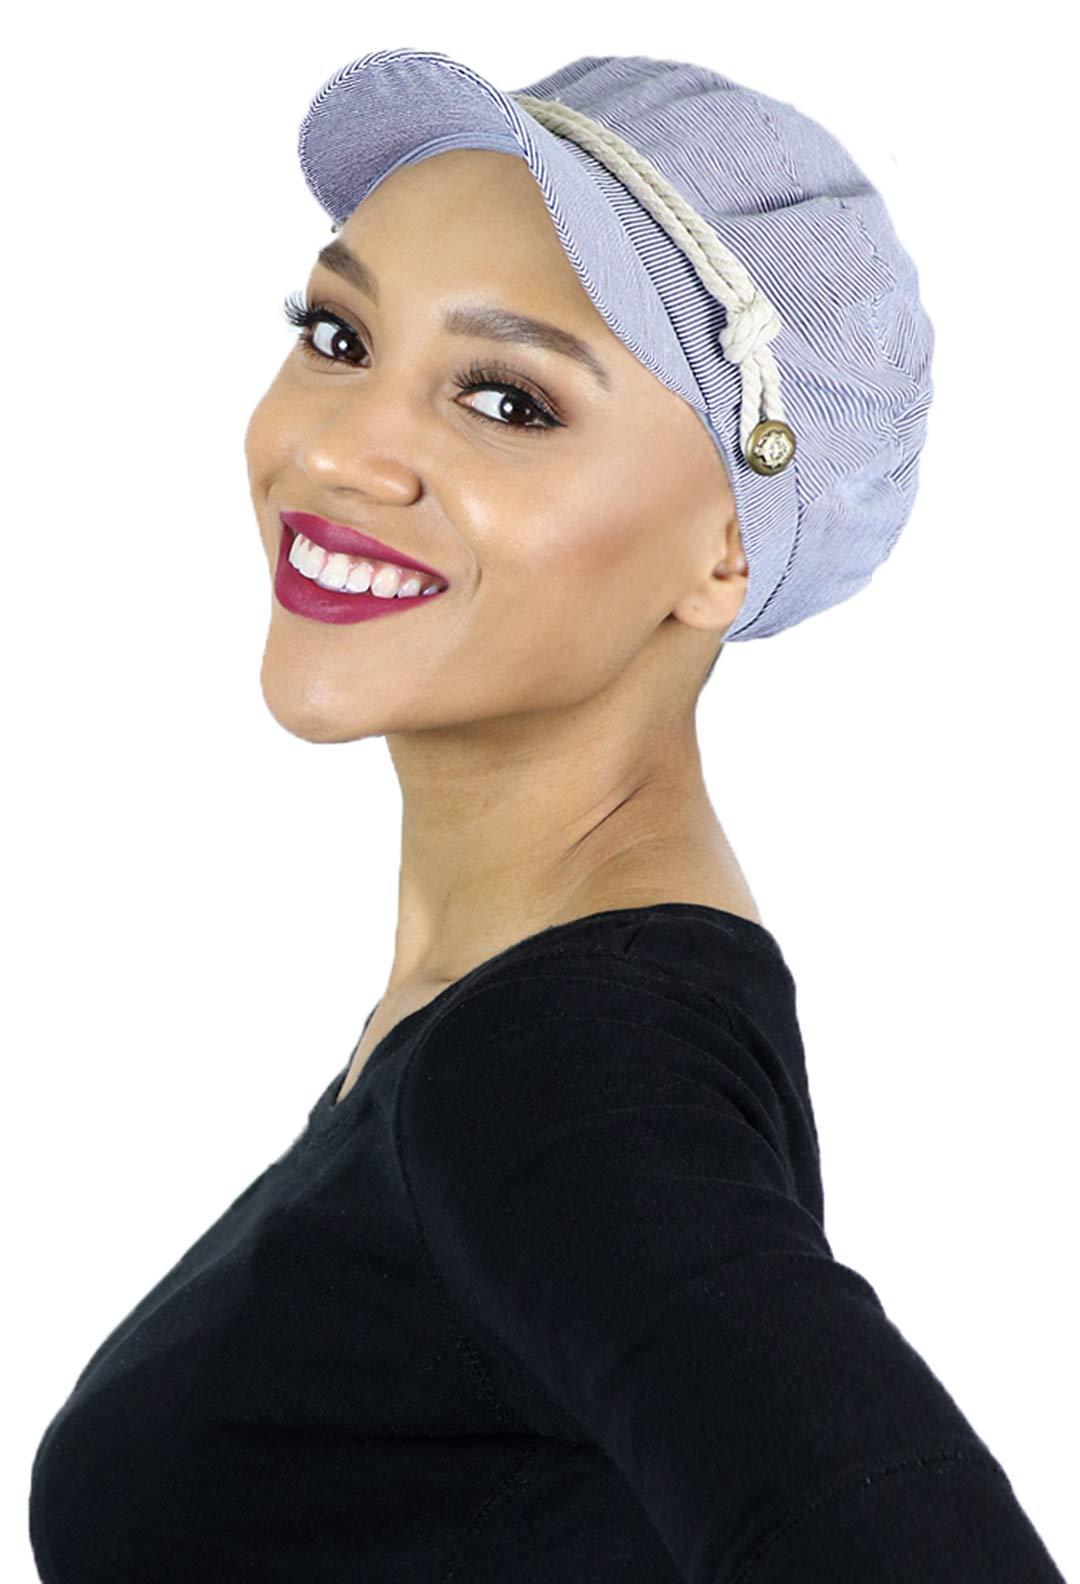 Summer Hats Beach Sun Newsboy Cap for Women Ladies Nautical Cabbie Chemo Headwear Head Coverings Seersucker (Blue)